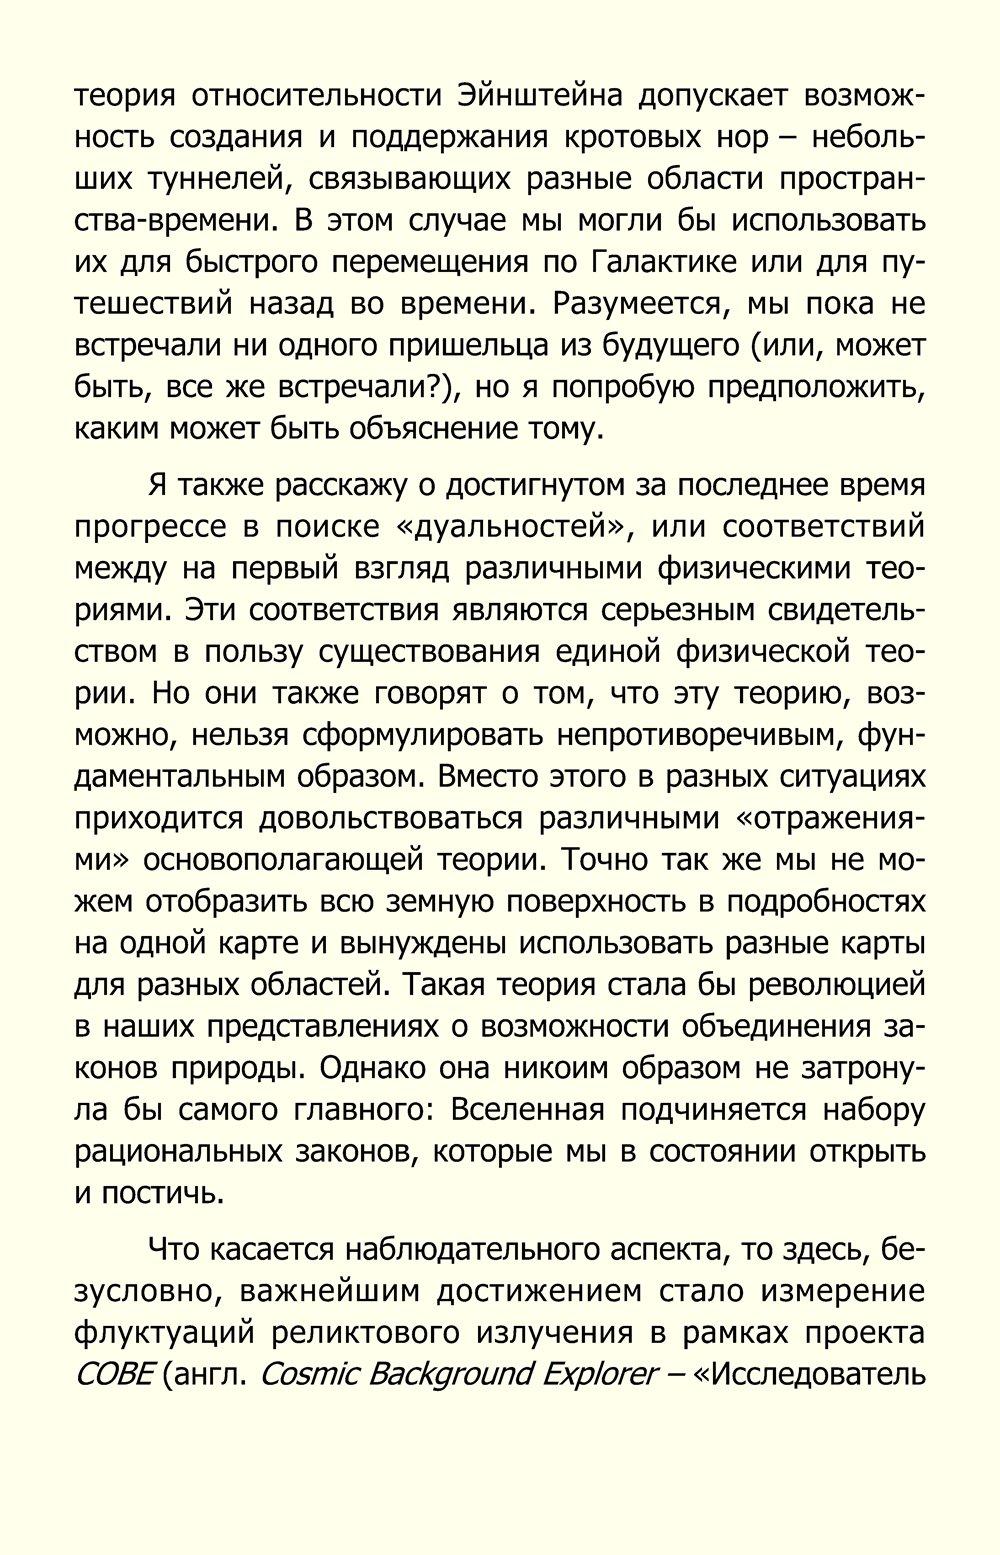 http://ipic.su/img/img7/fs/Kratkayaistoriyavremeni.1554796282.jpg